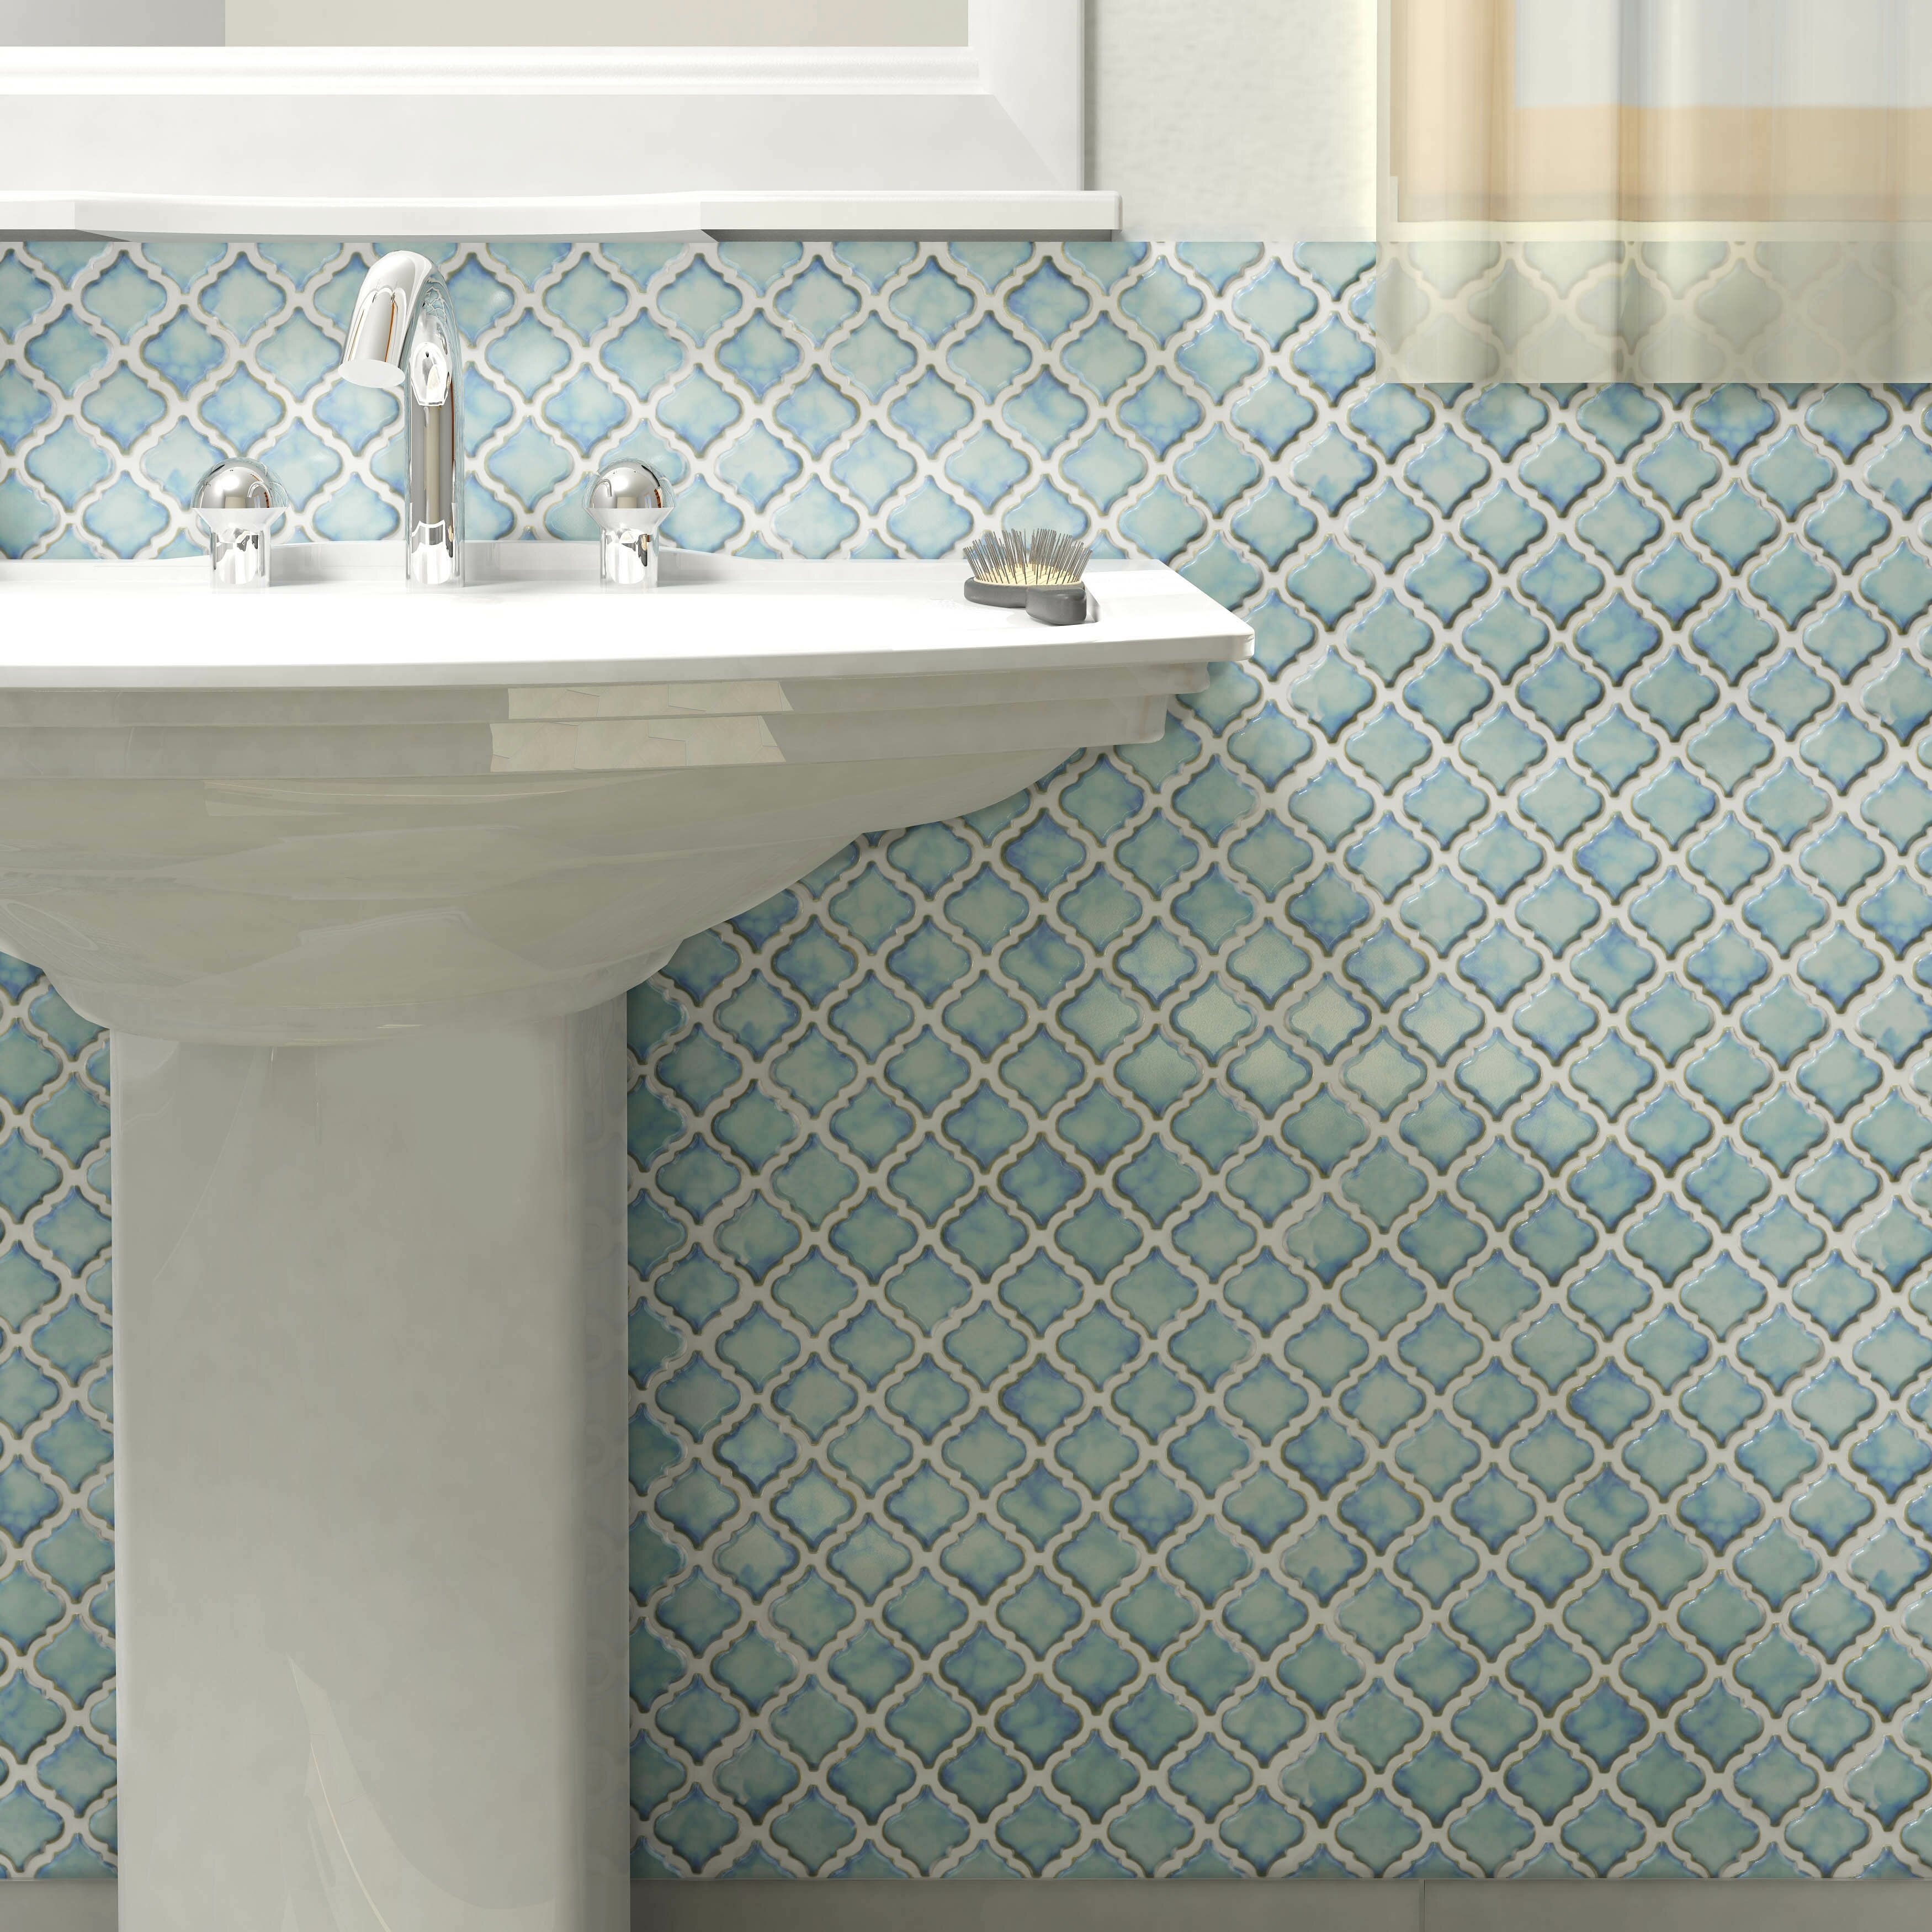 Elitetile Pharsalia 2 X Porcelain Mosaic Tile In Marine Reviews Wayfair